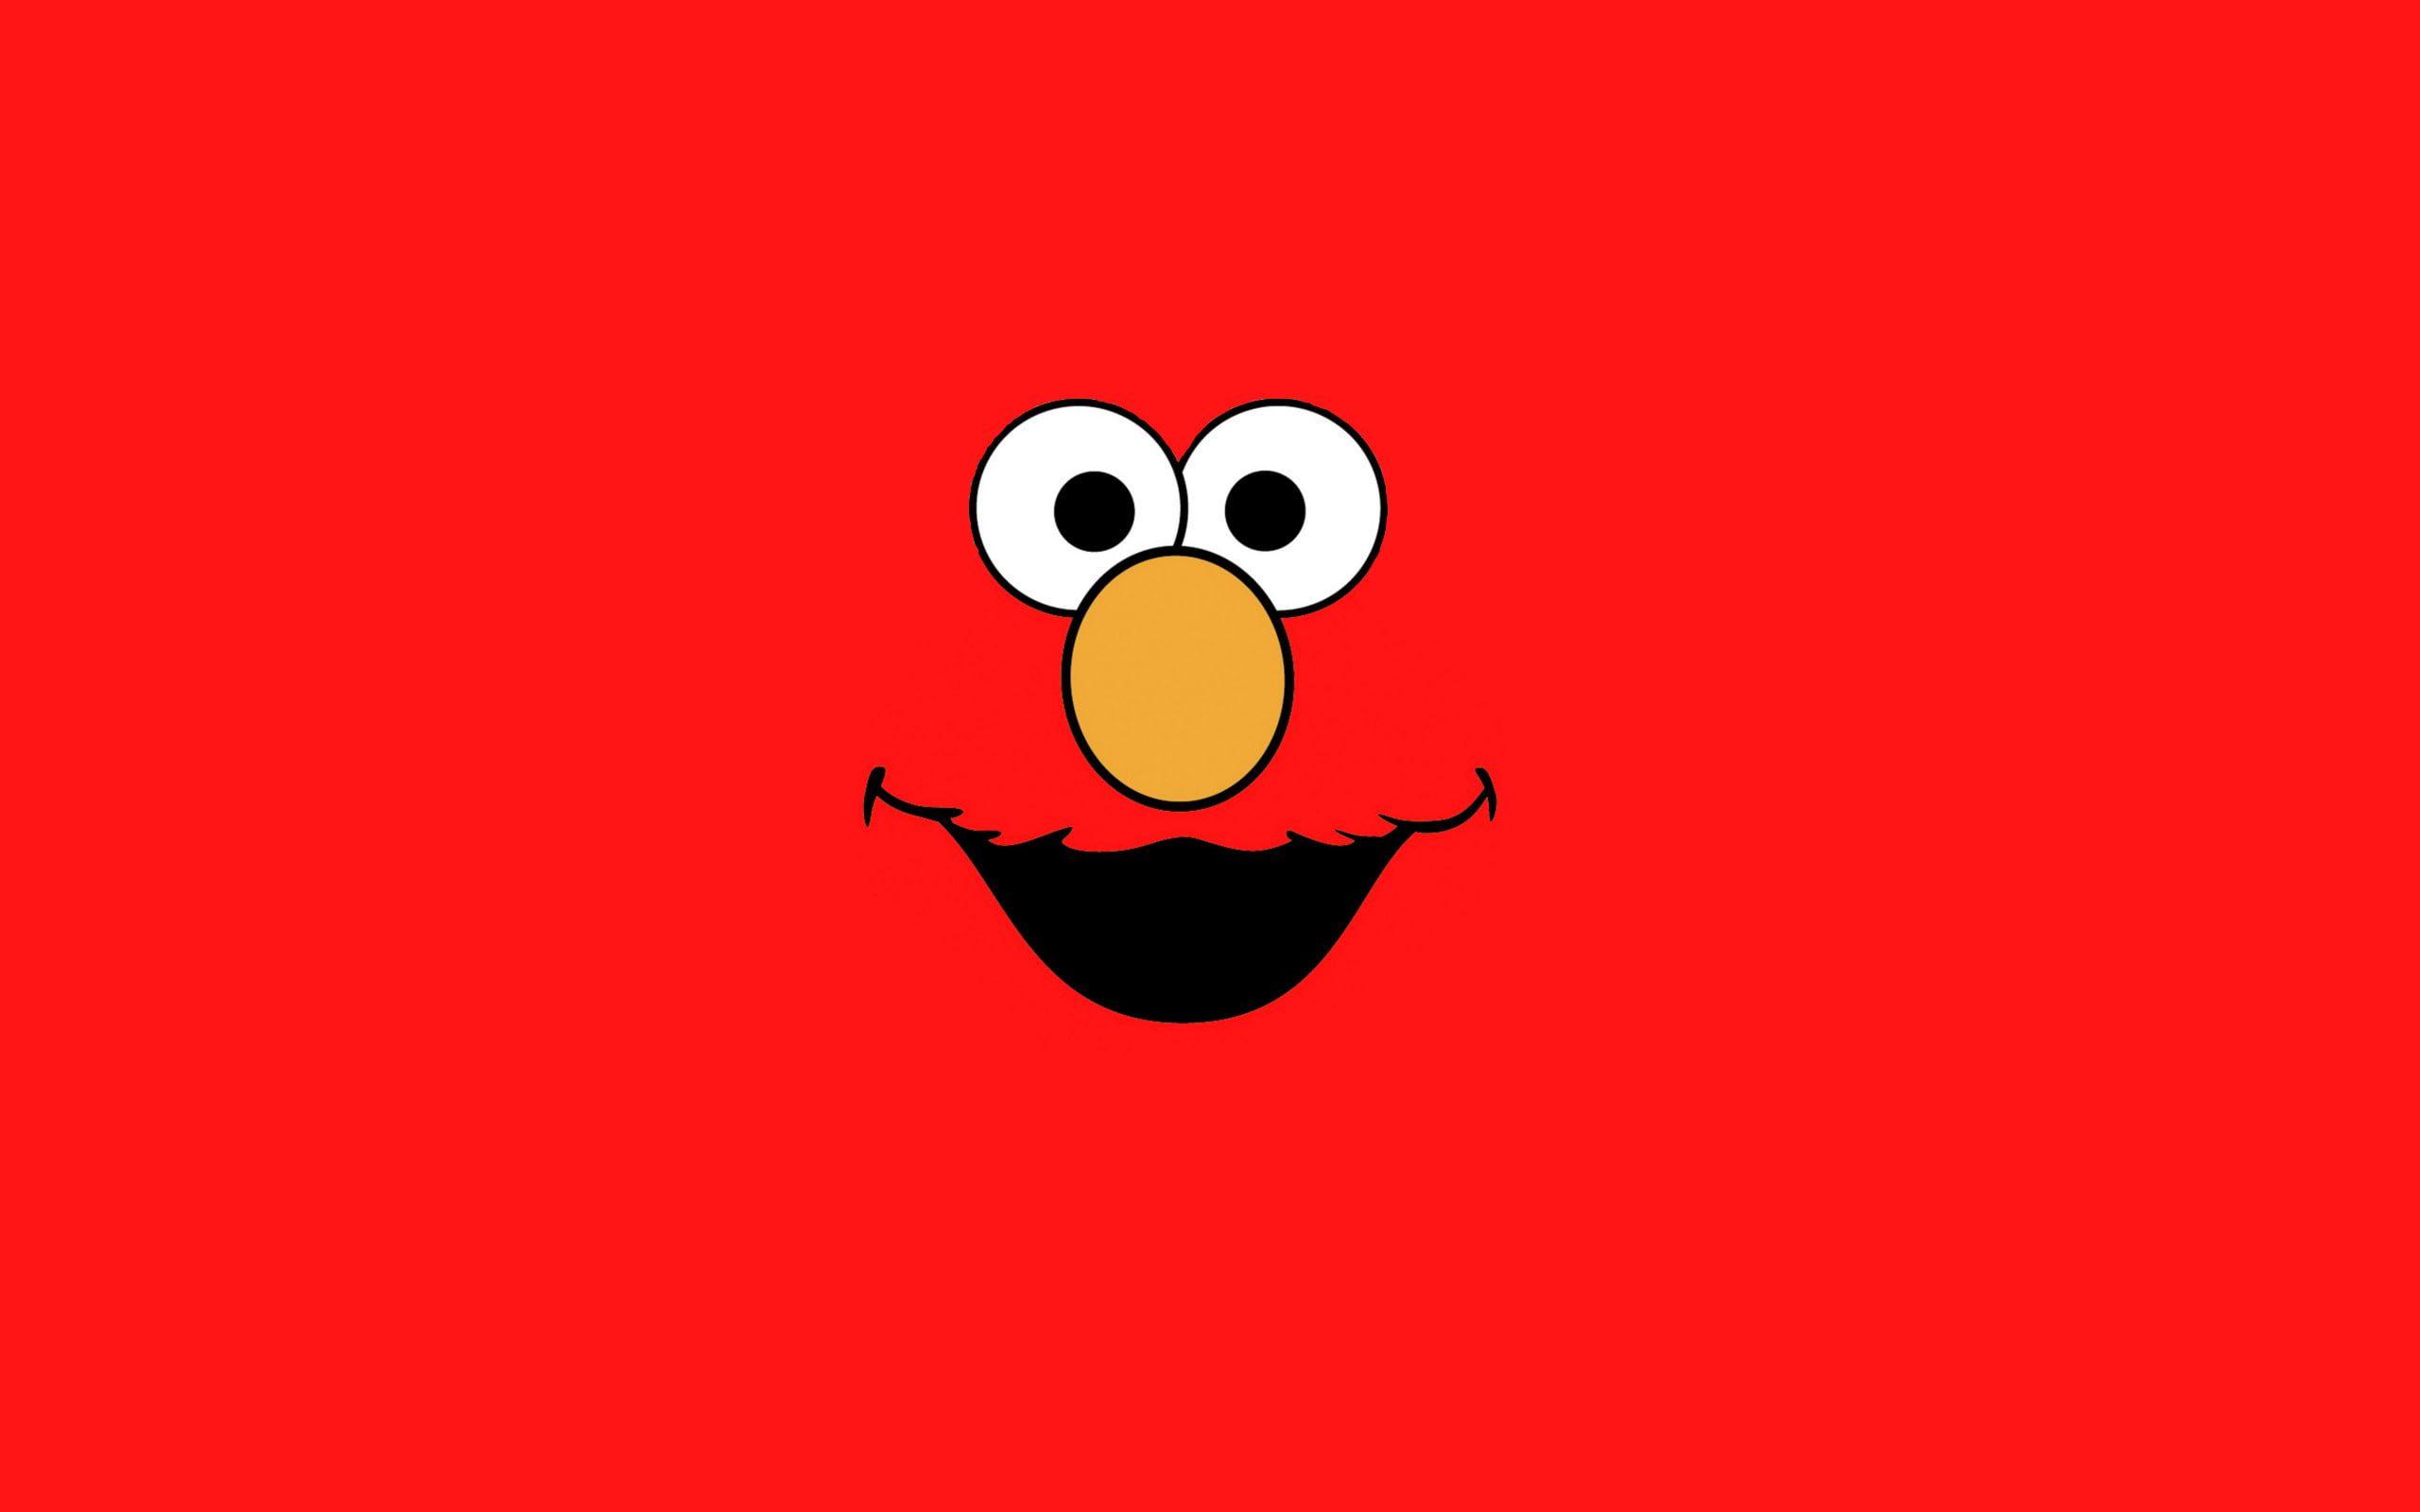 Sesame Street Minimalism Elmo 2k Wallpaper Hdwallpaper Desktop Elmo Wallpaper Sesame Street Elmo